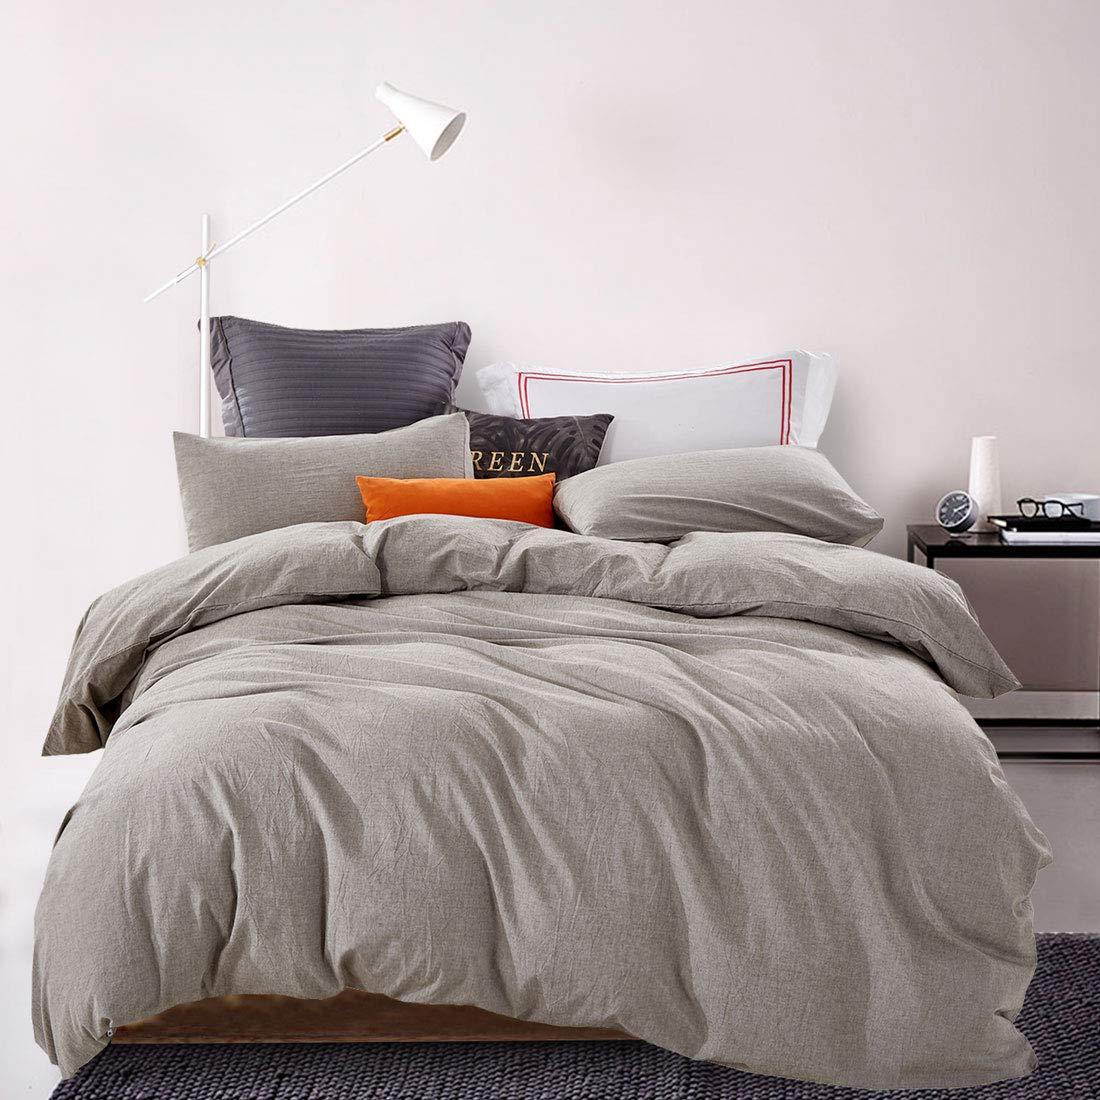 ATsense Duvet Cover Sets, 100% Washed Cotton, Queen 3-Piece Bedding Duvet Cover, Simple Style Farmhouse Bedding Set (Grey 7063) by ATsense (Image #1)